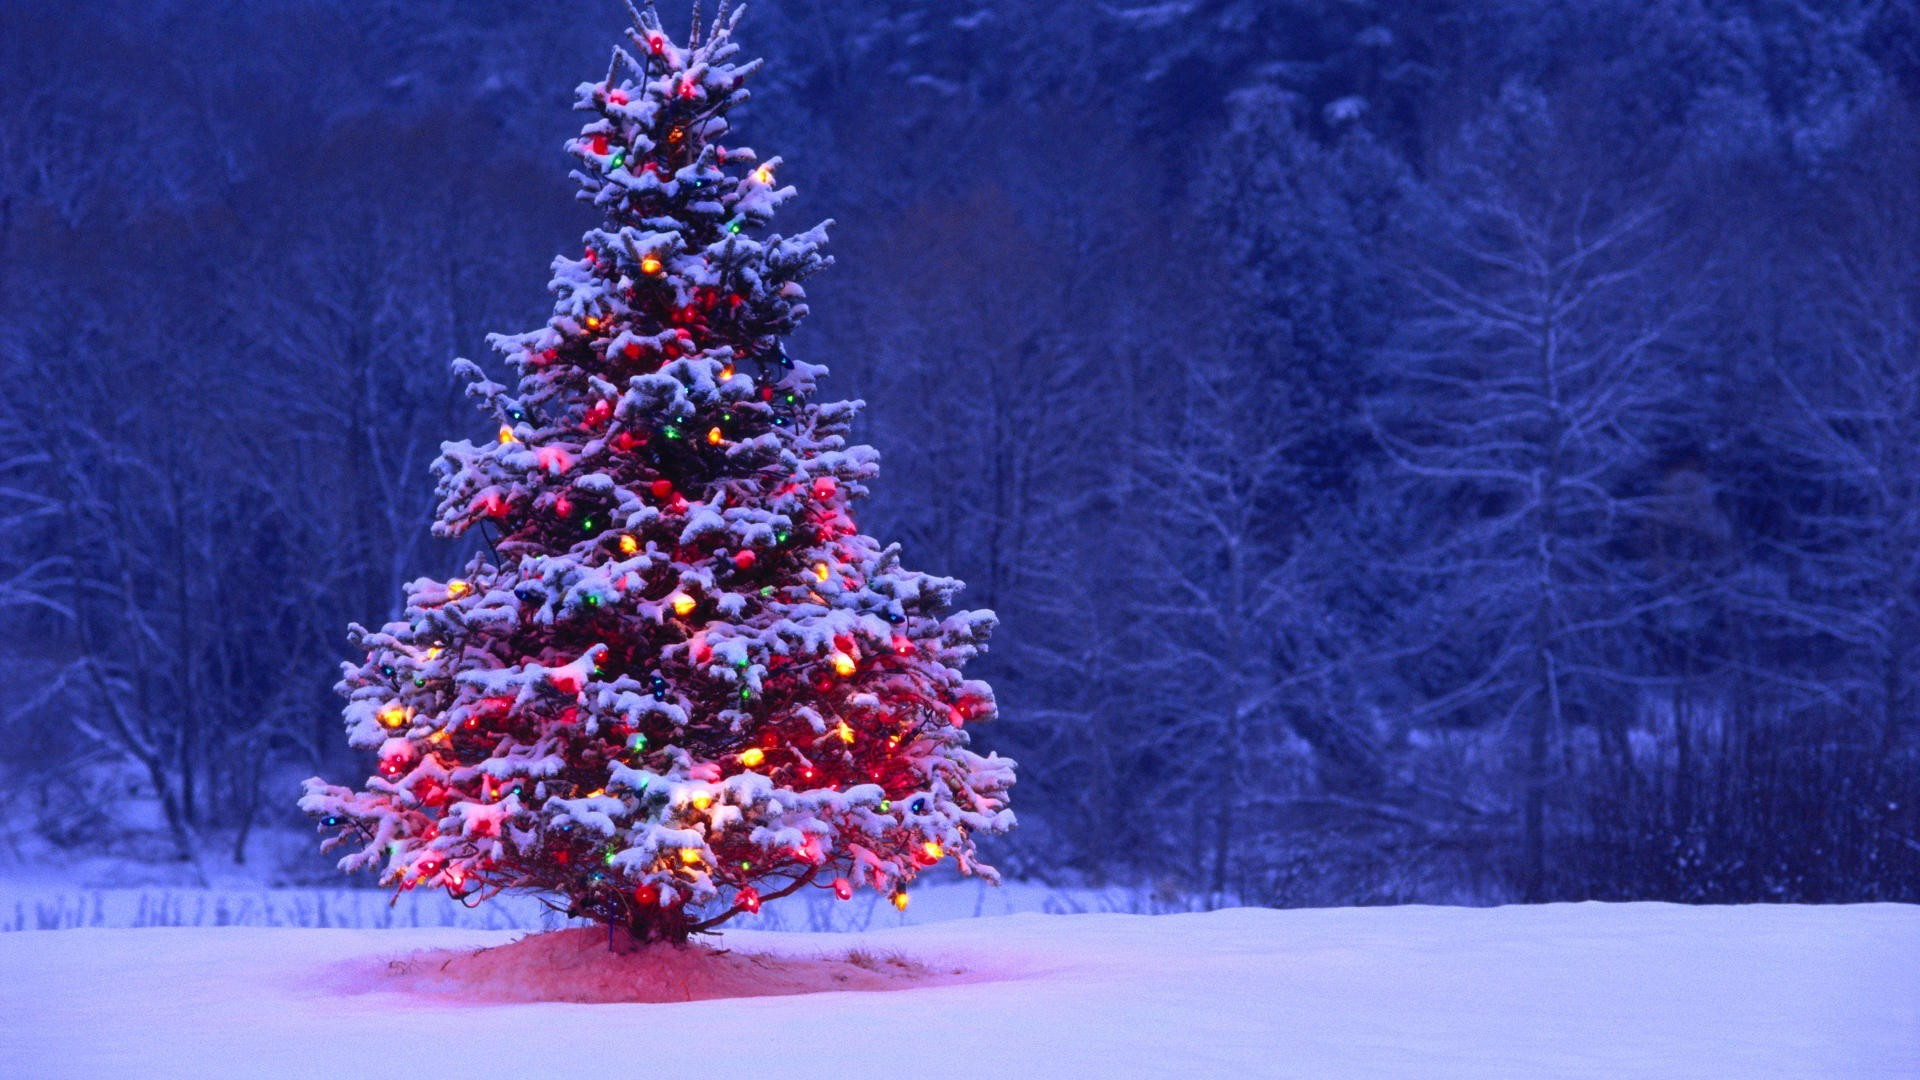 Winter Christmas Desktop Backgrounds 50 Images